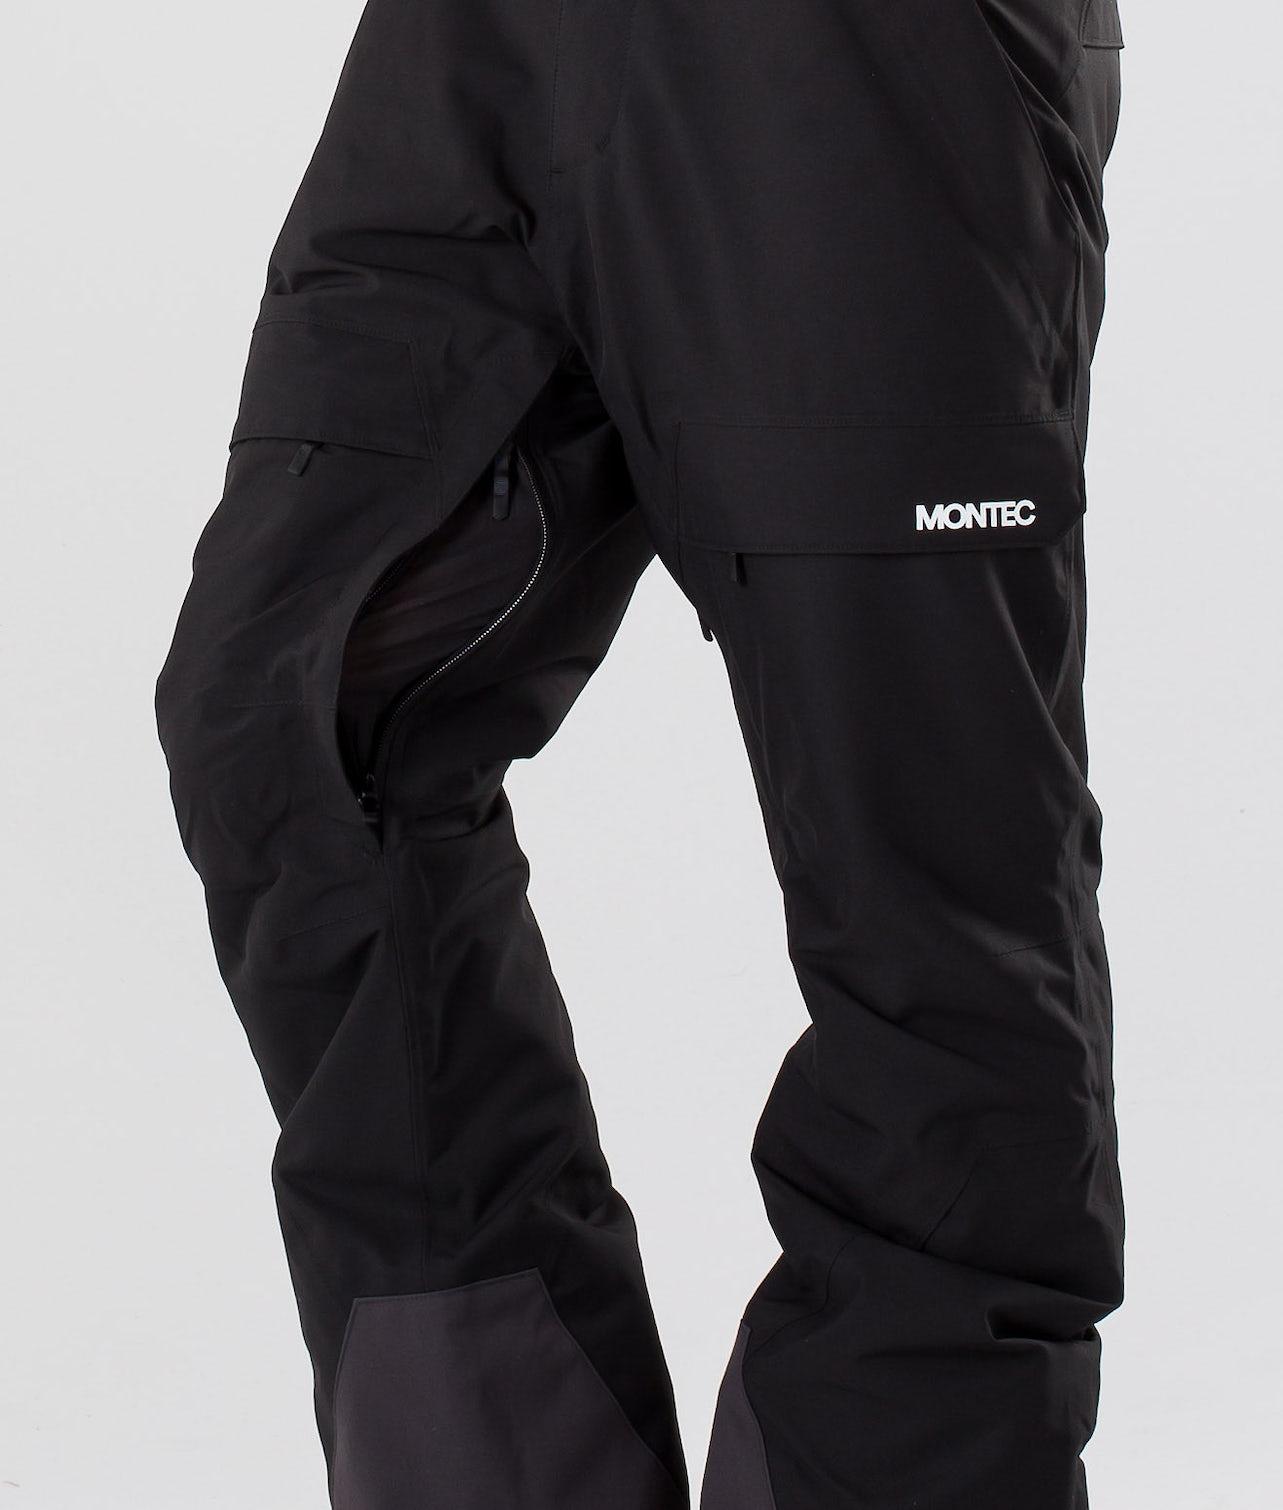 Montec Dune Snowboardbukse Black